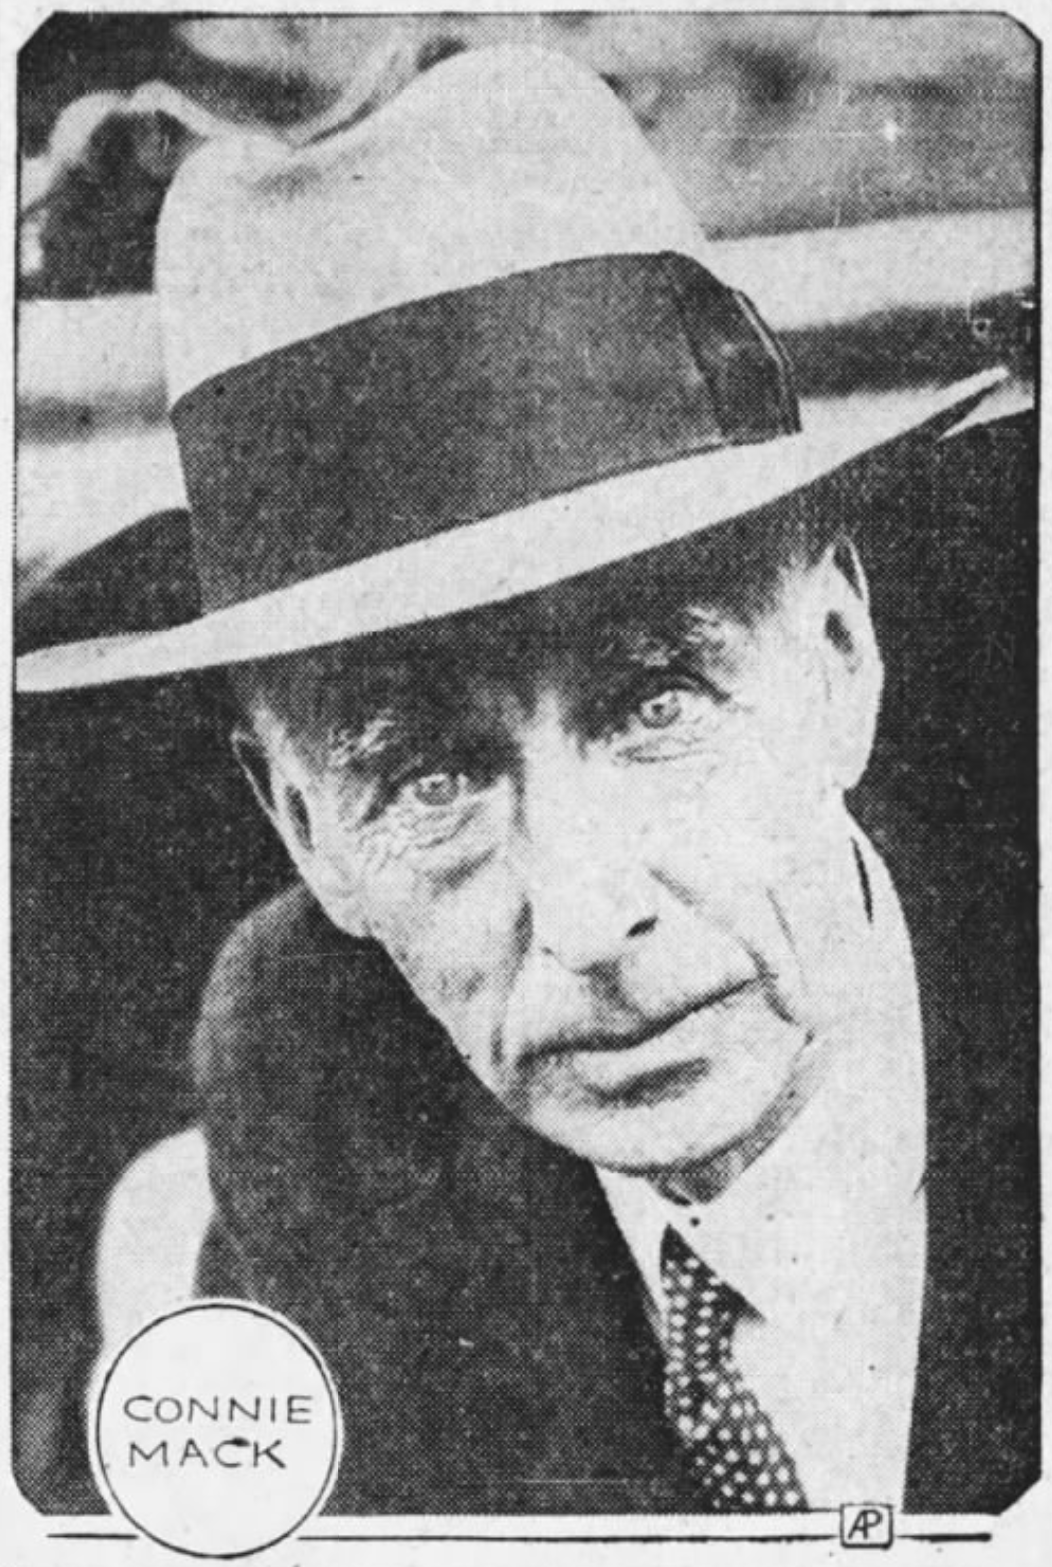 Connie Mack, 1933.